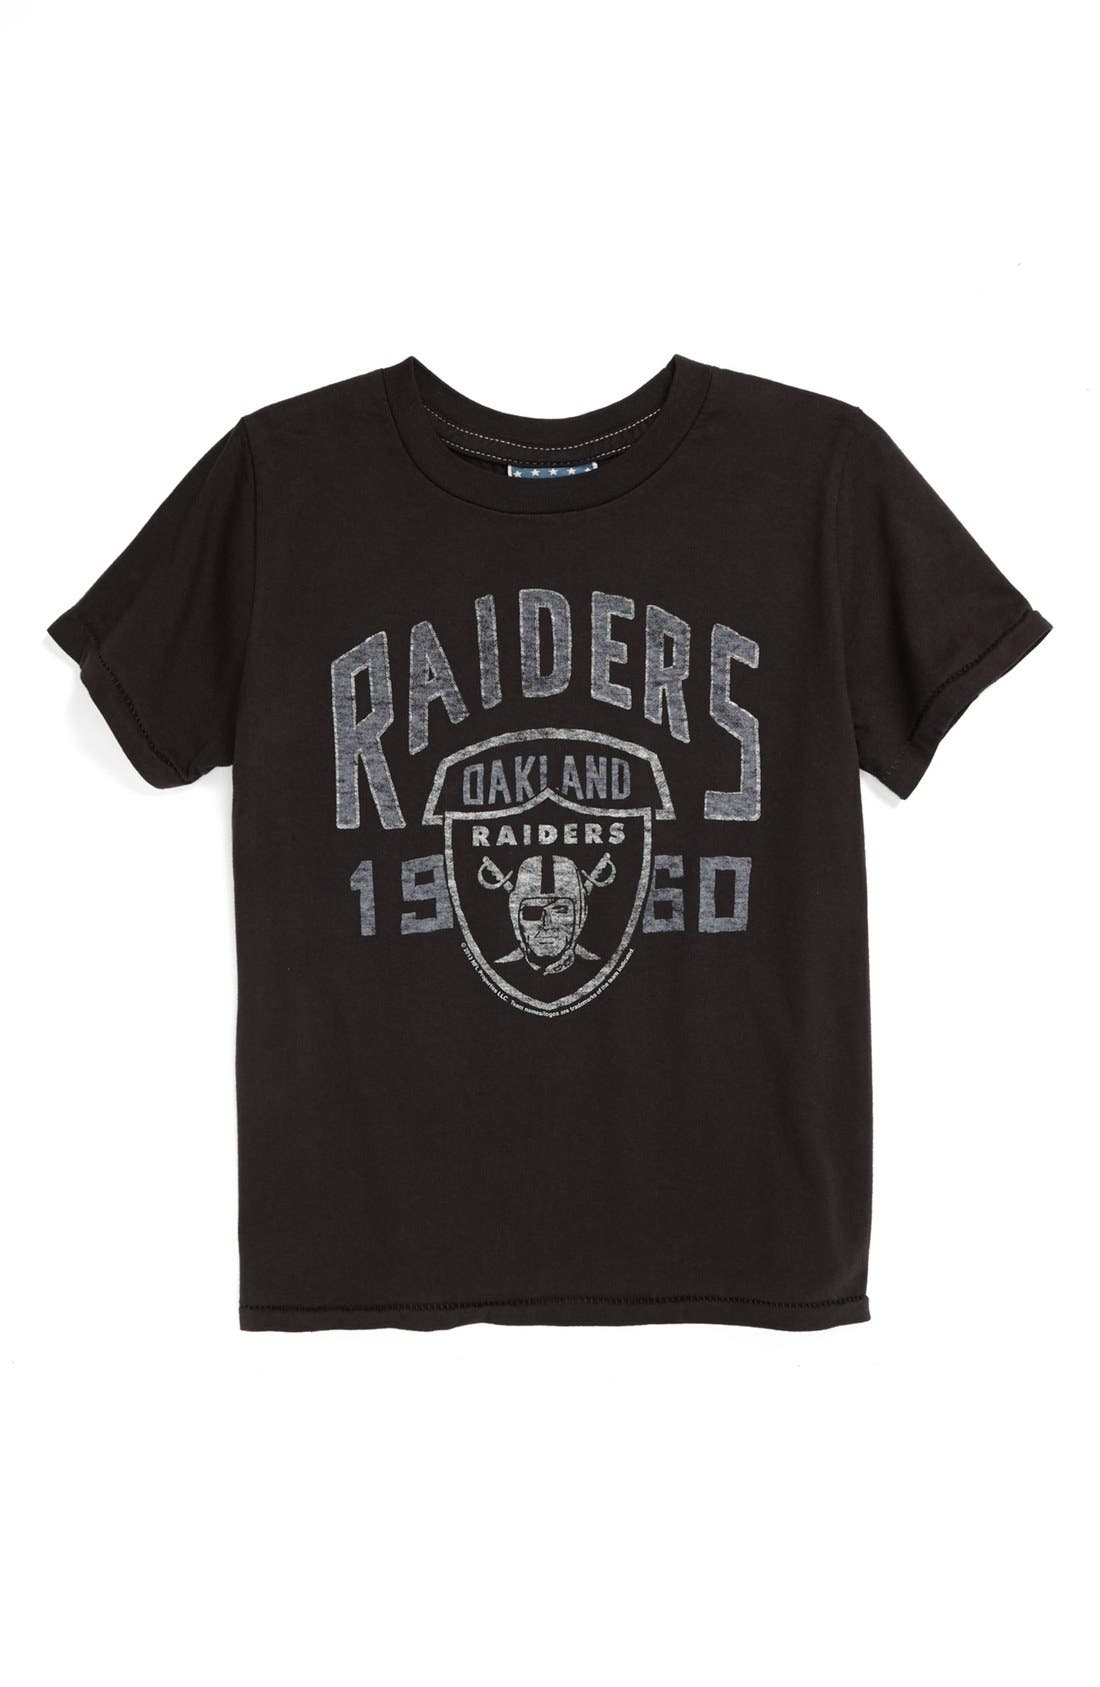 Alternate Image 1 Selected - Junk Food 'Oakland Raiders' T-Shirt (Toddler Boys)